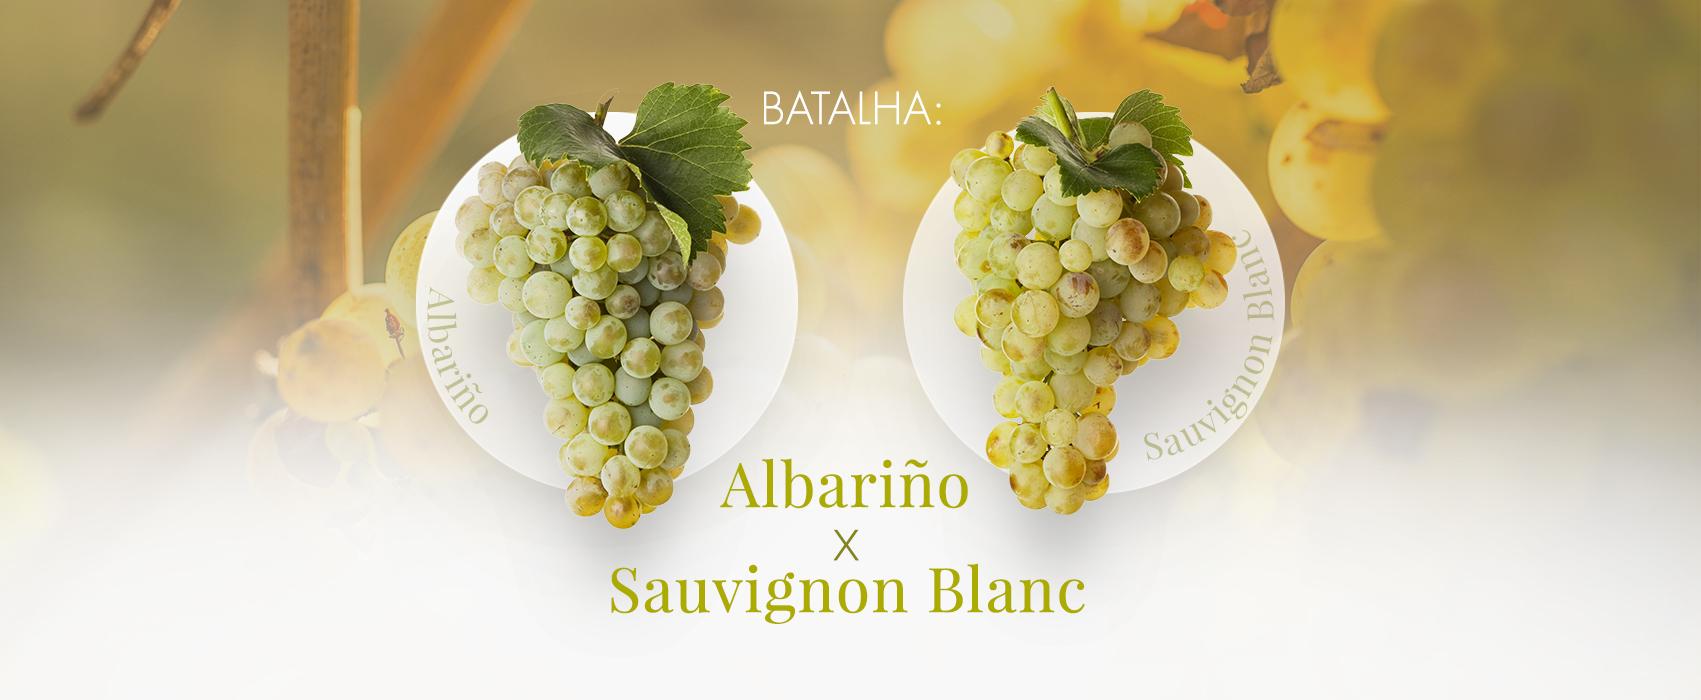 Batalha - Albariño x Sauvignon Blanc